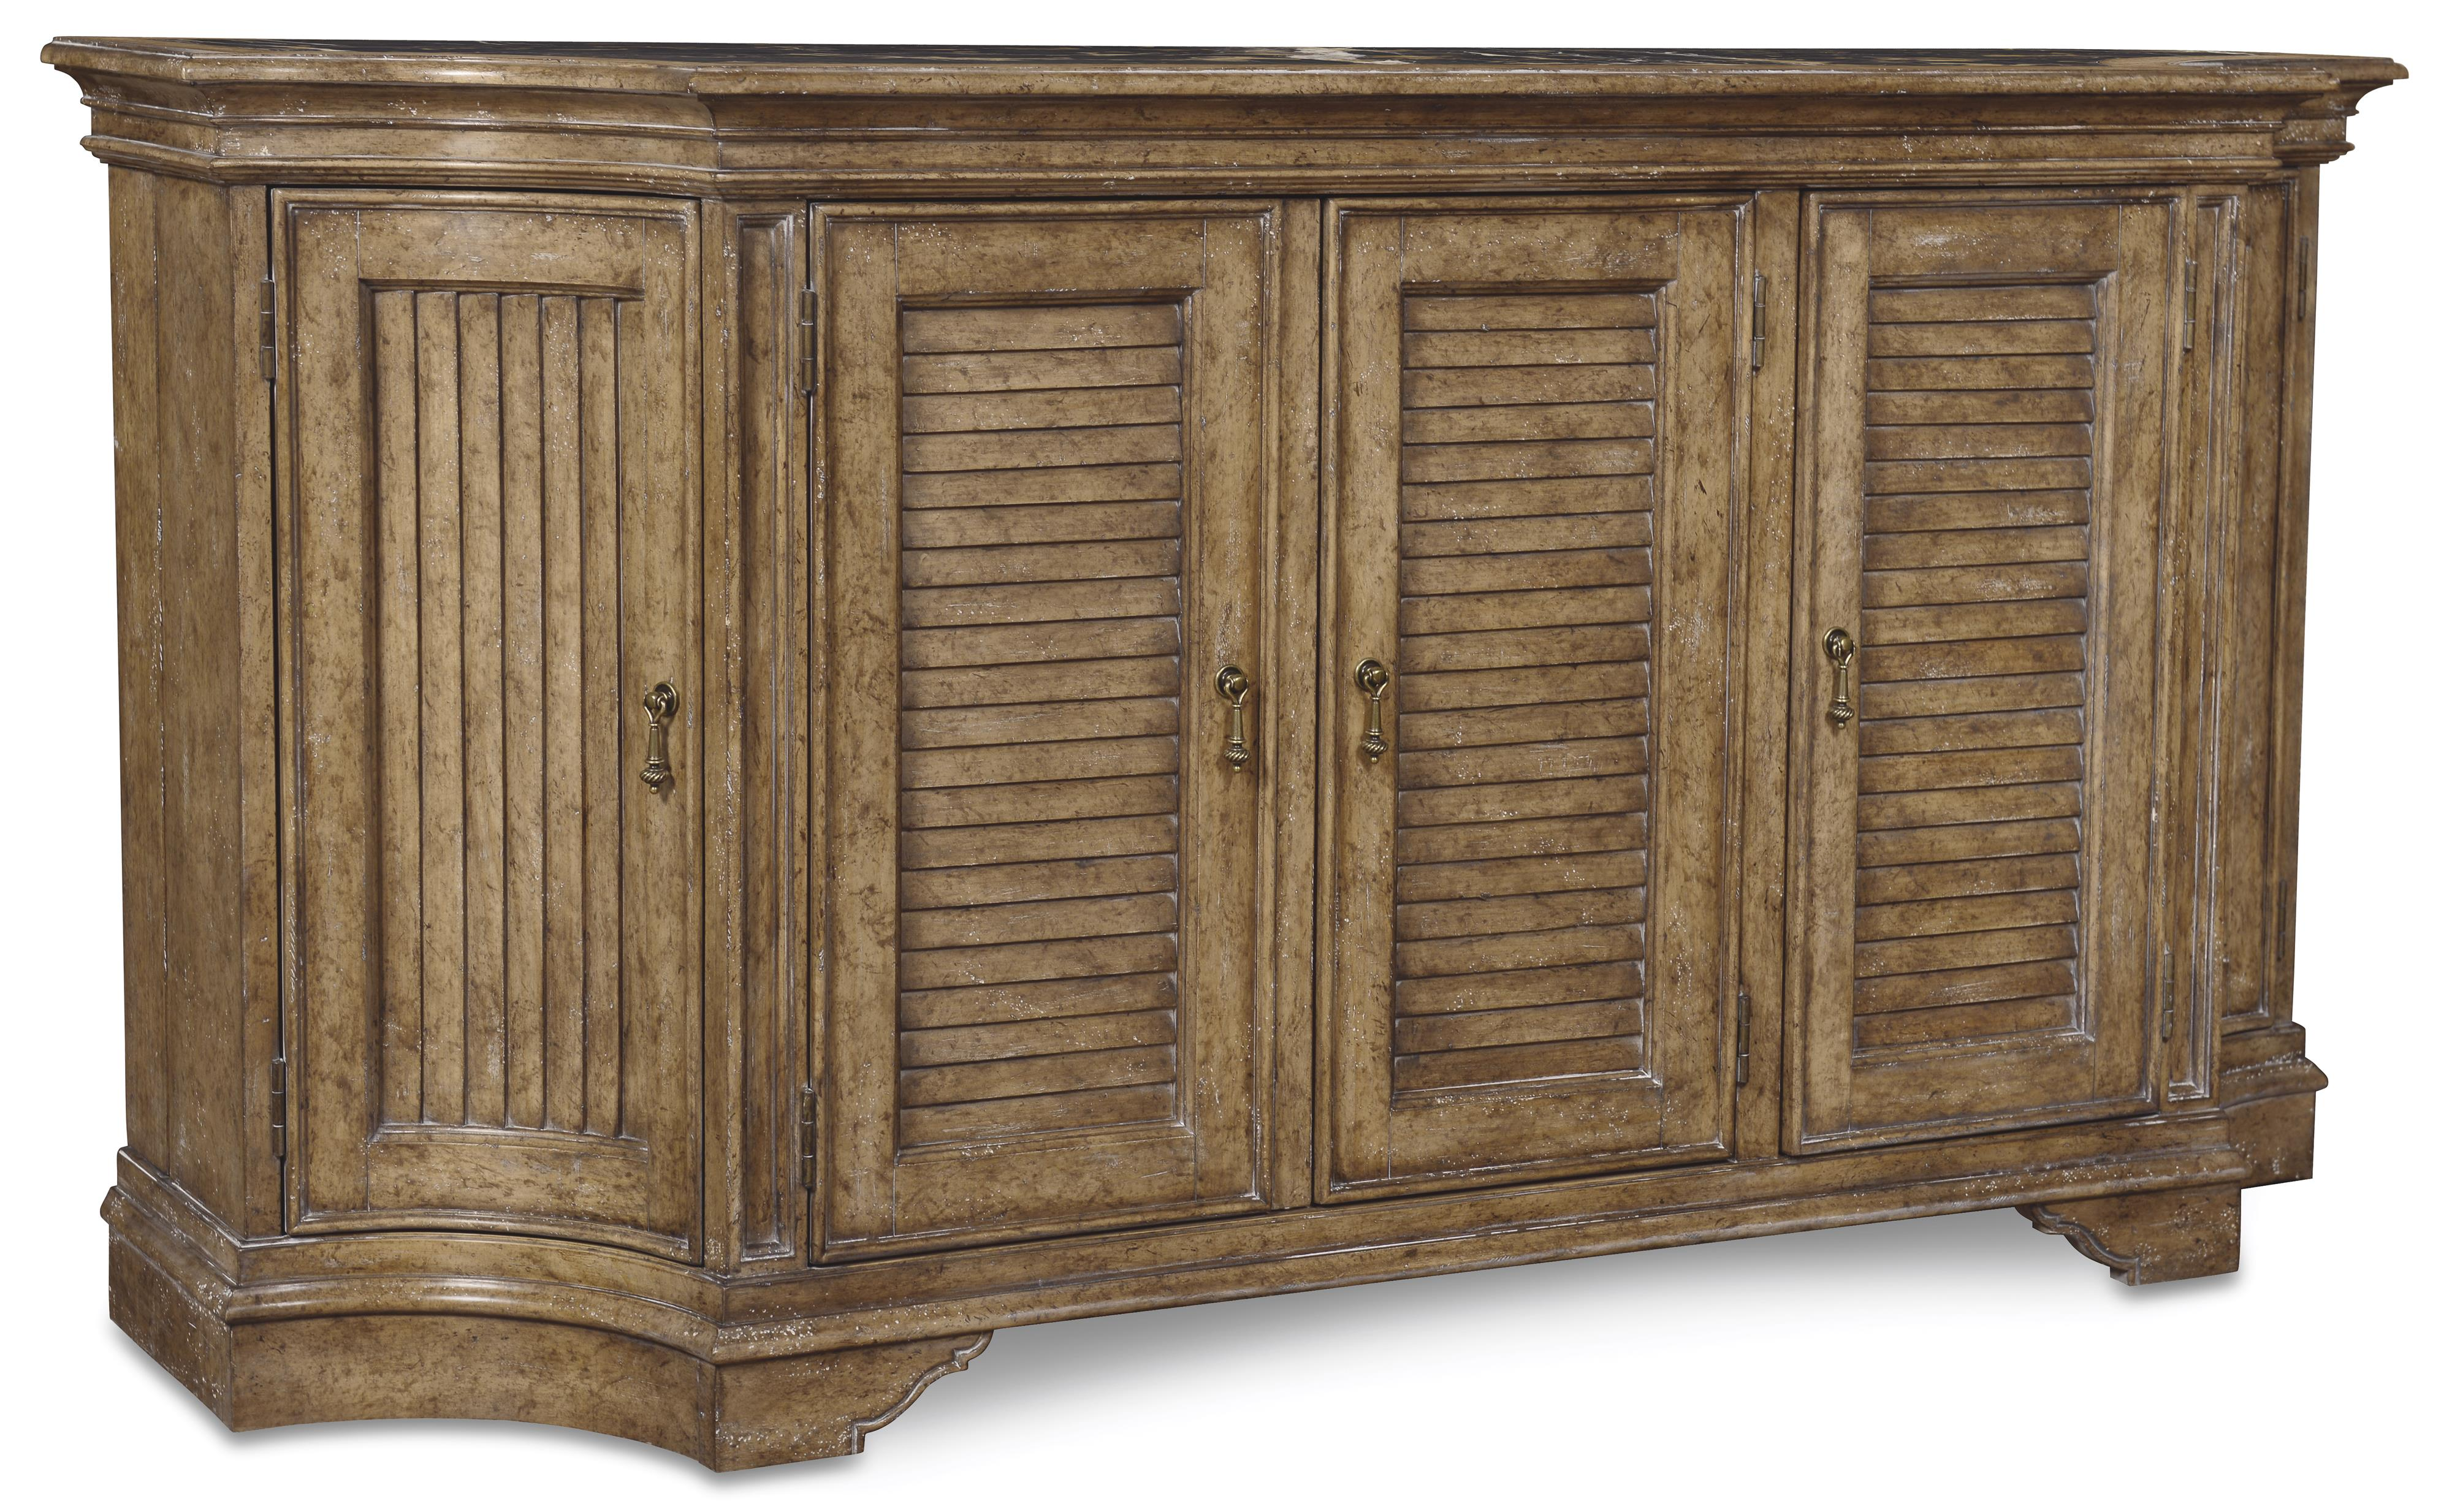 A.R.T. Furniture Inc Pavilion Buffet - Item Number: 229251-2608